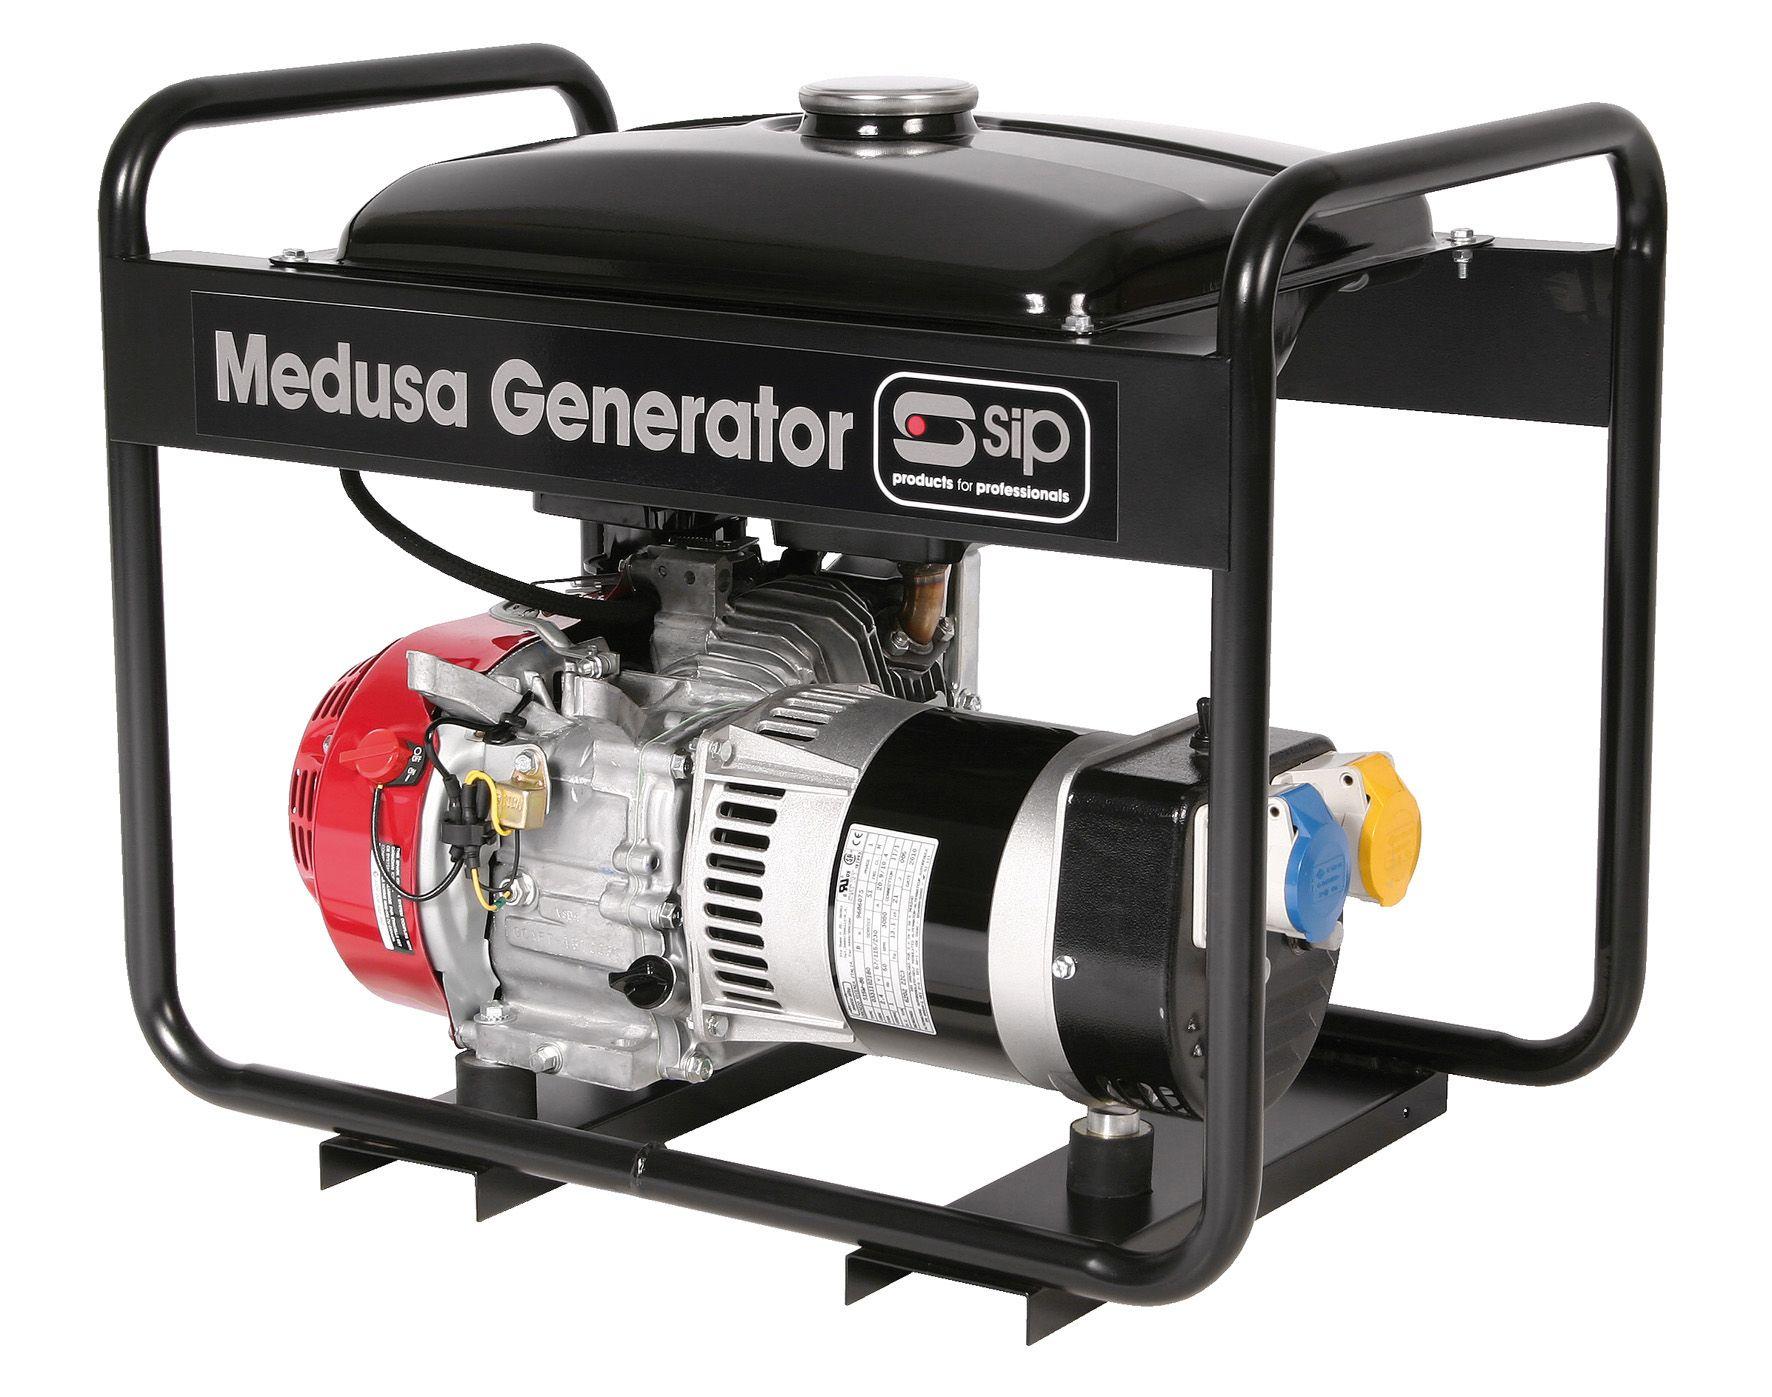 SIP Professional Medusa Mghp3.0Flr 3.75Kva Full Frame Long Range Petrol Generato